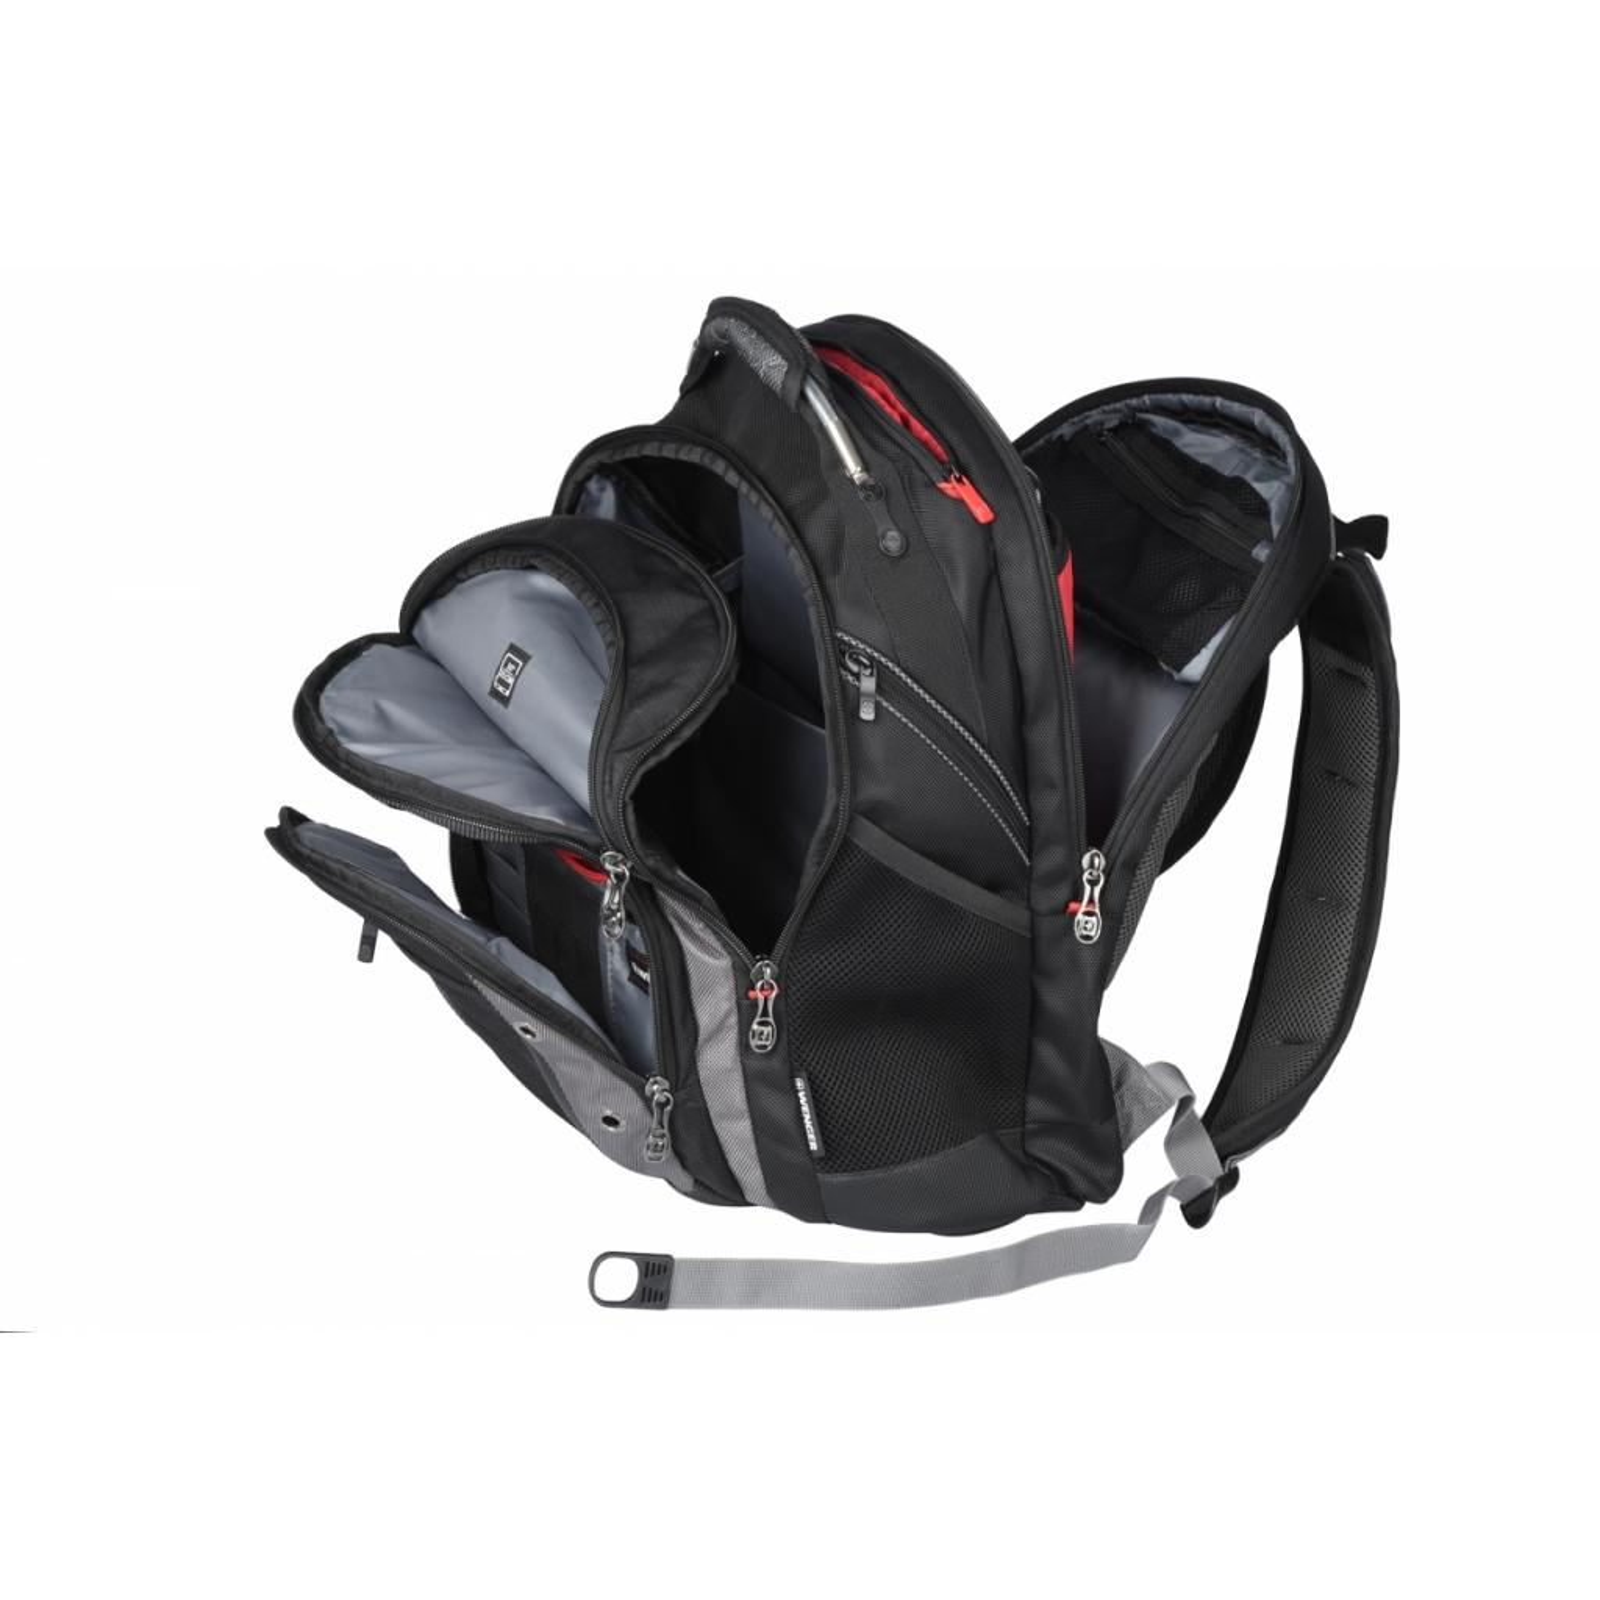 "Рюкзак для ноутбука Wenger 16"" Synergy Black/Gray (600635) изображение 4"